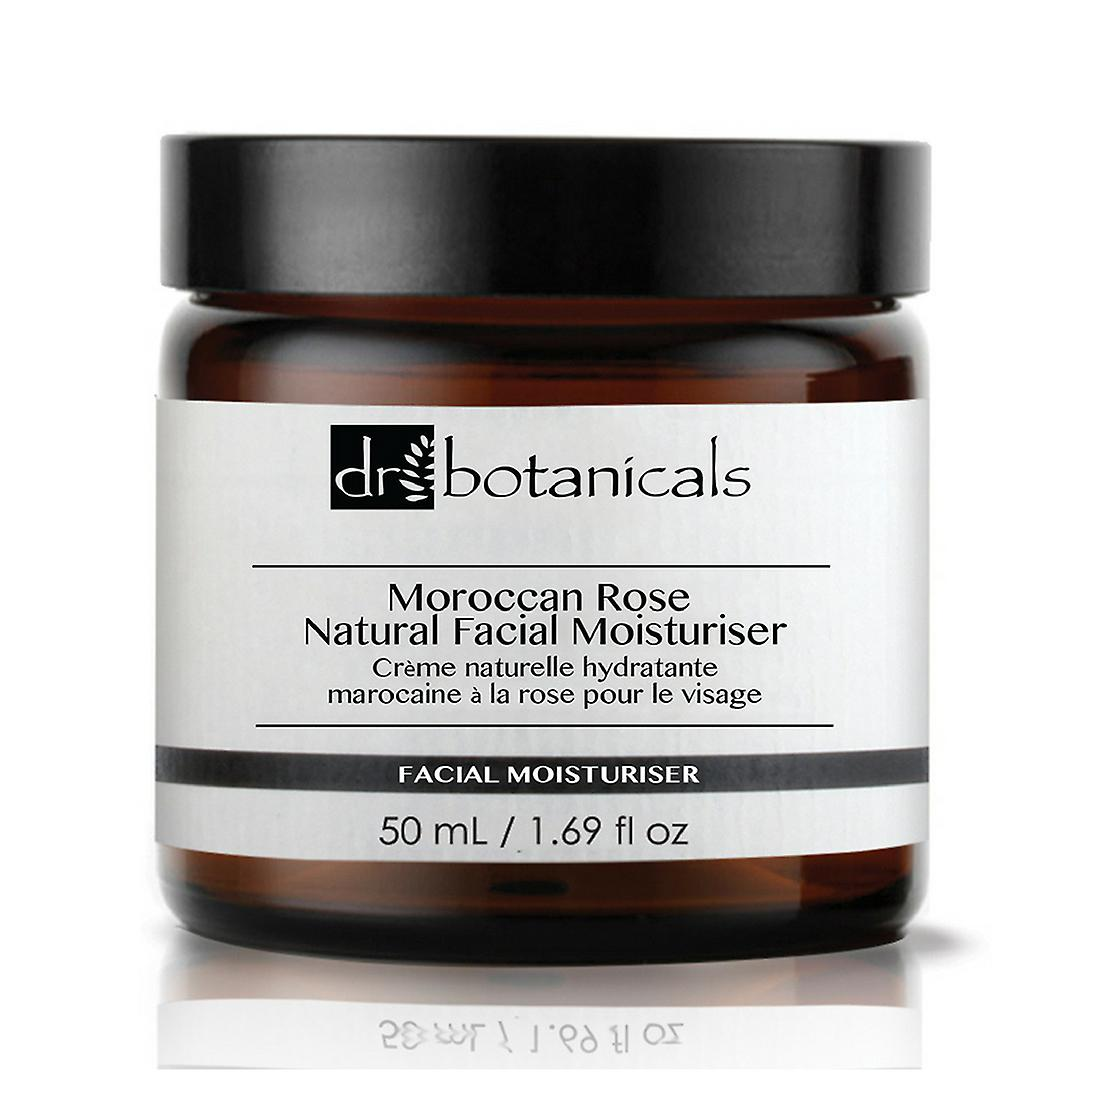 Dr. botanicals moroccan rose natural facial moisturiser